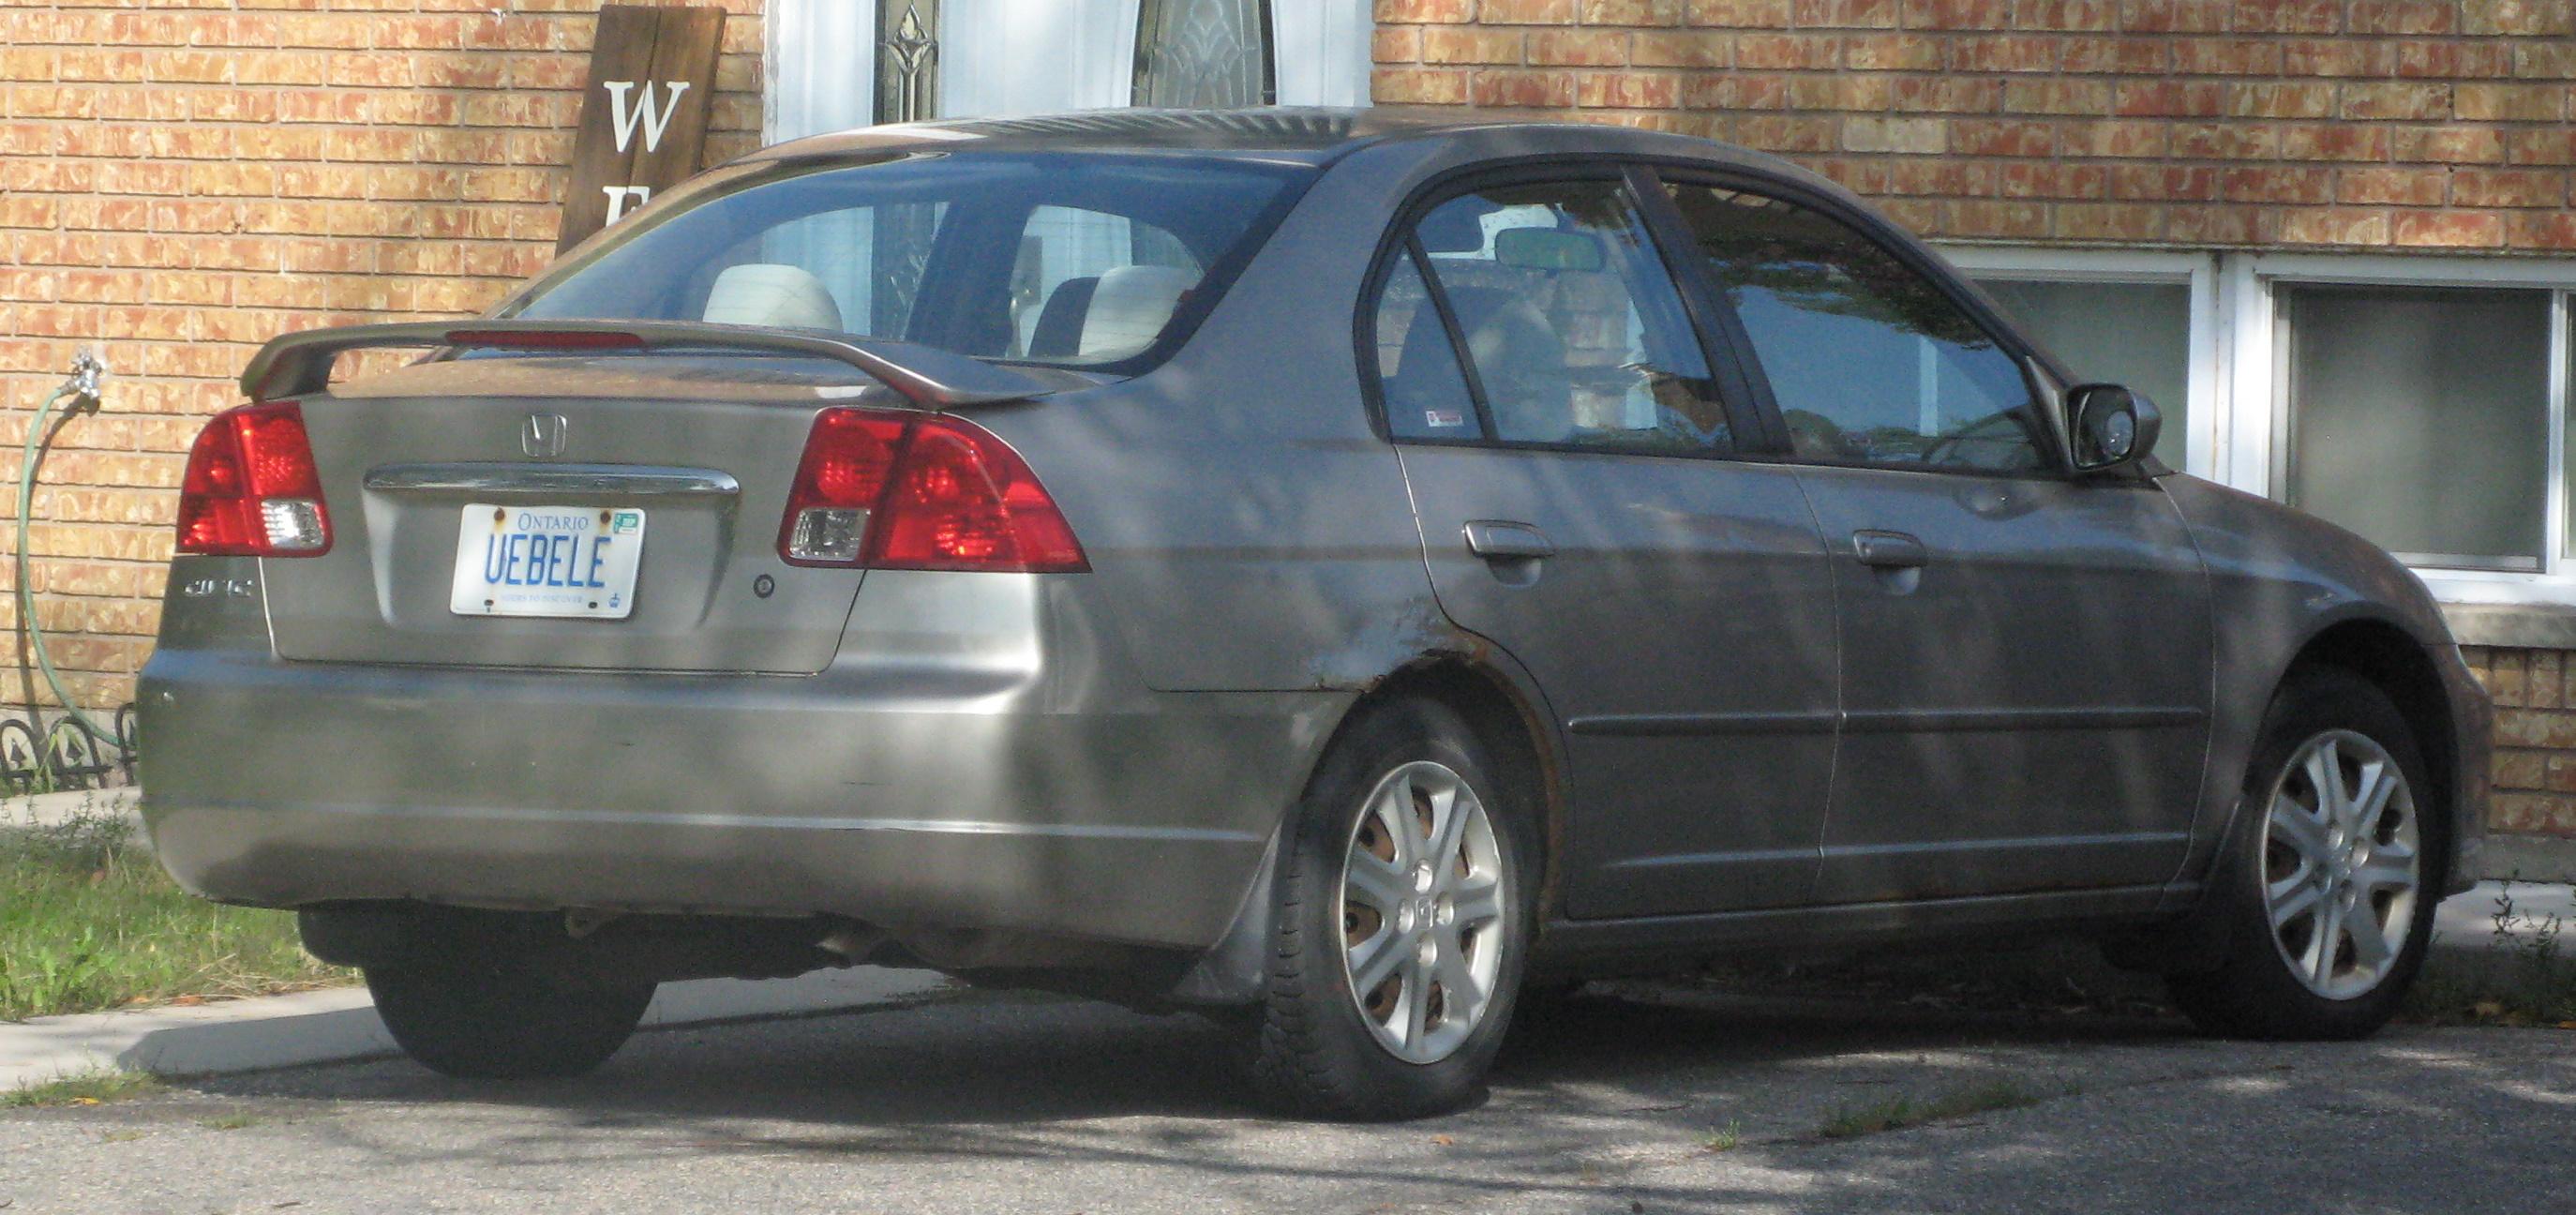 https commons wikimedia org wiki file 2003 honda civic lx rear right 09 14 2020 jpg